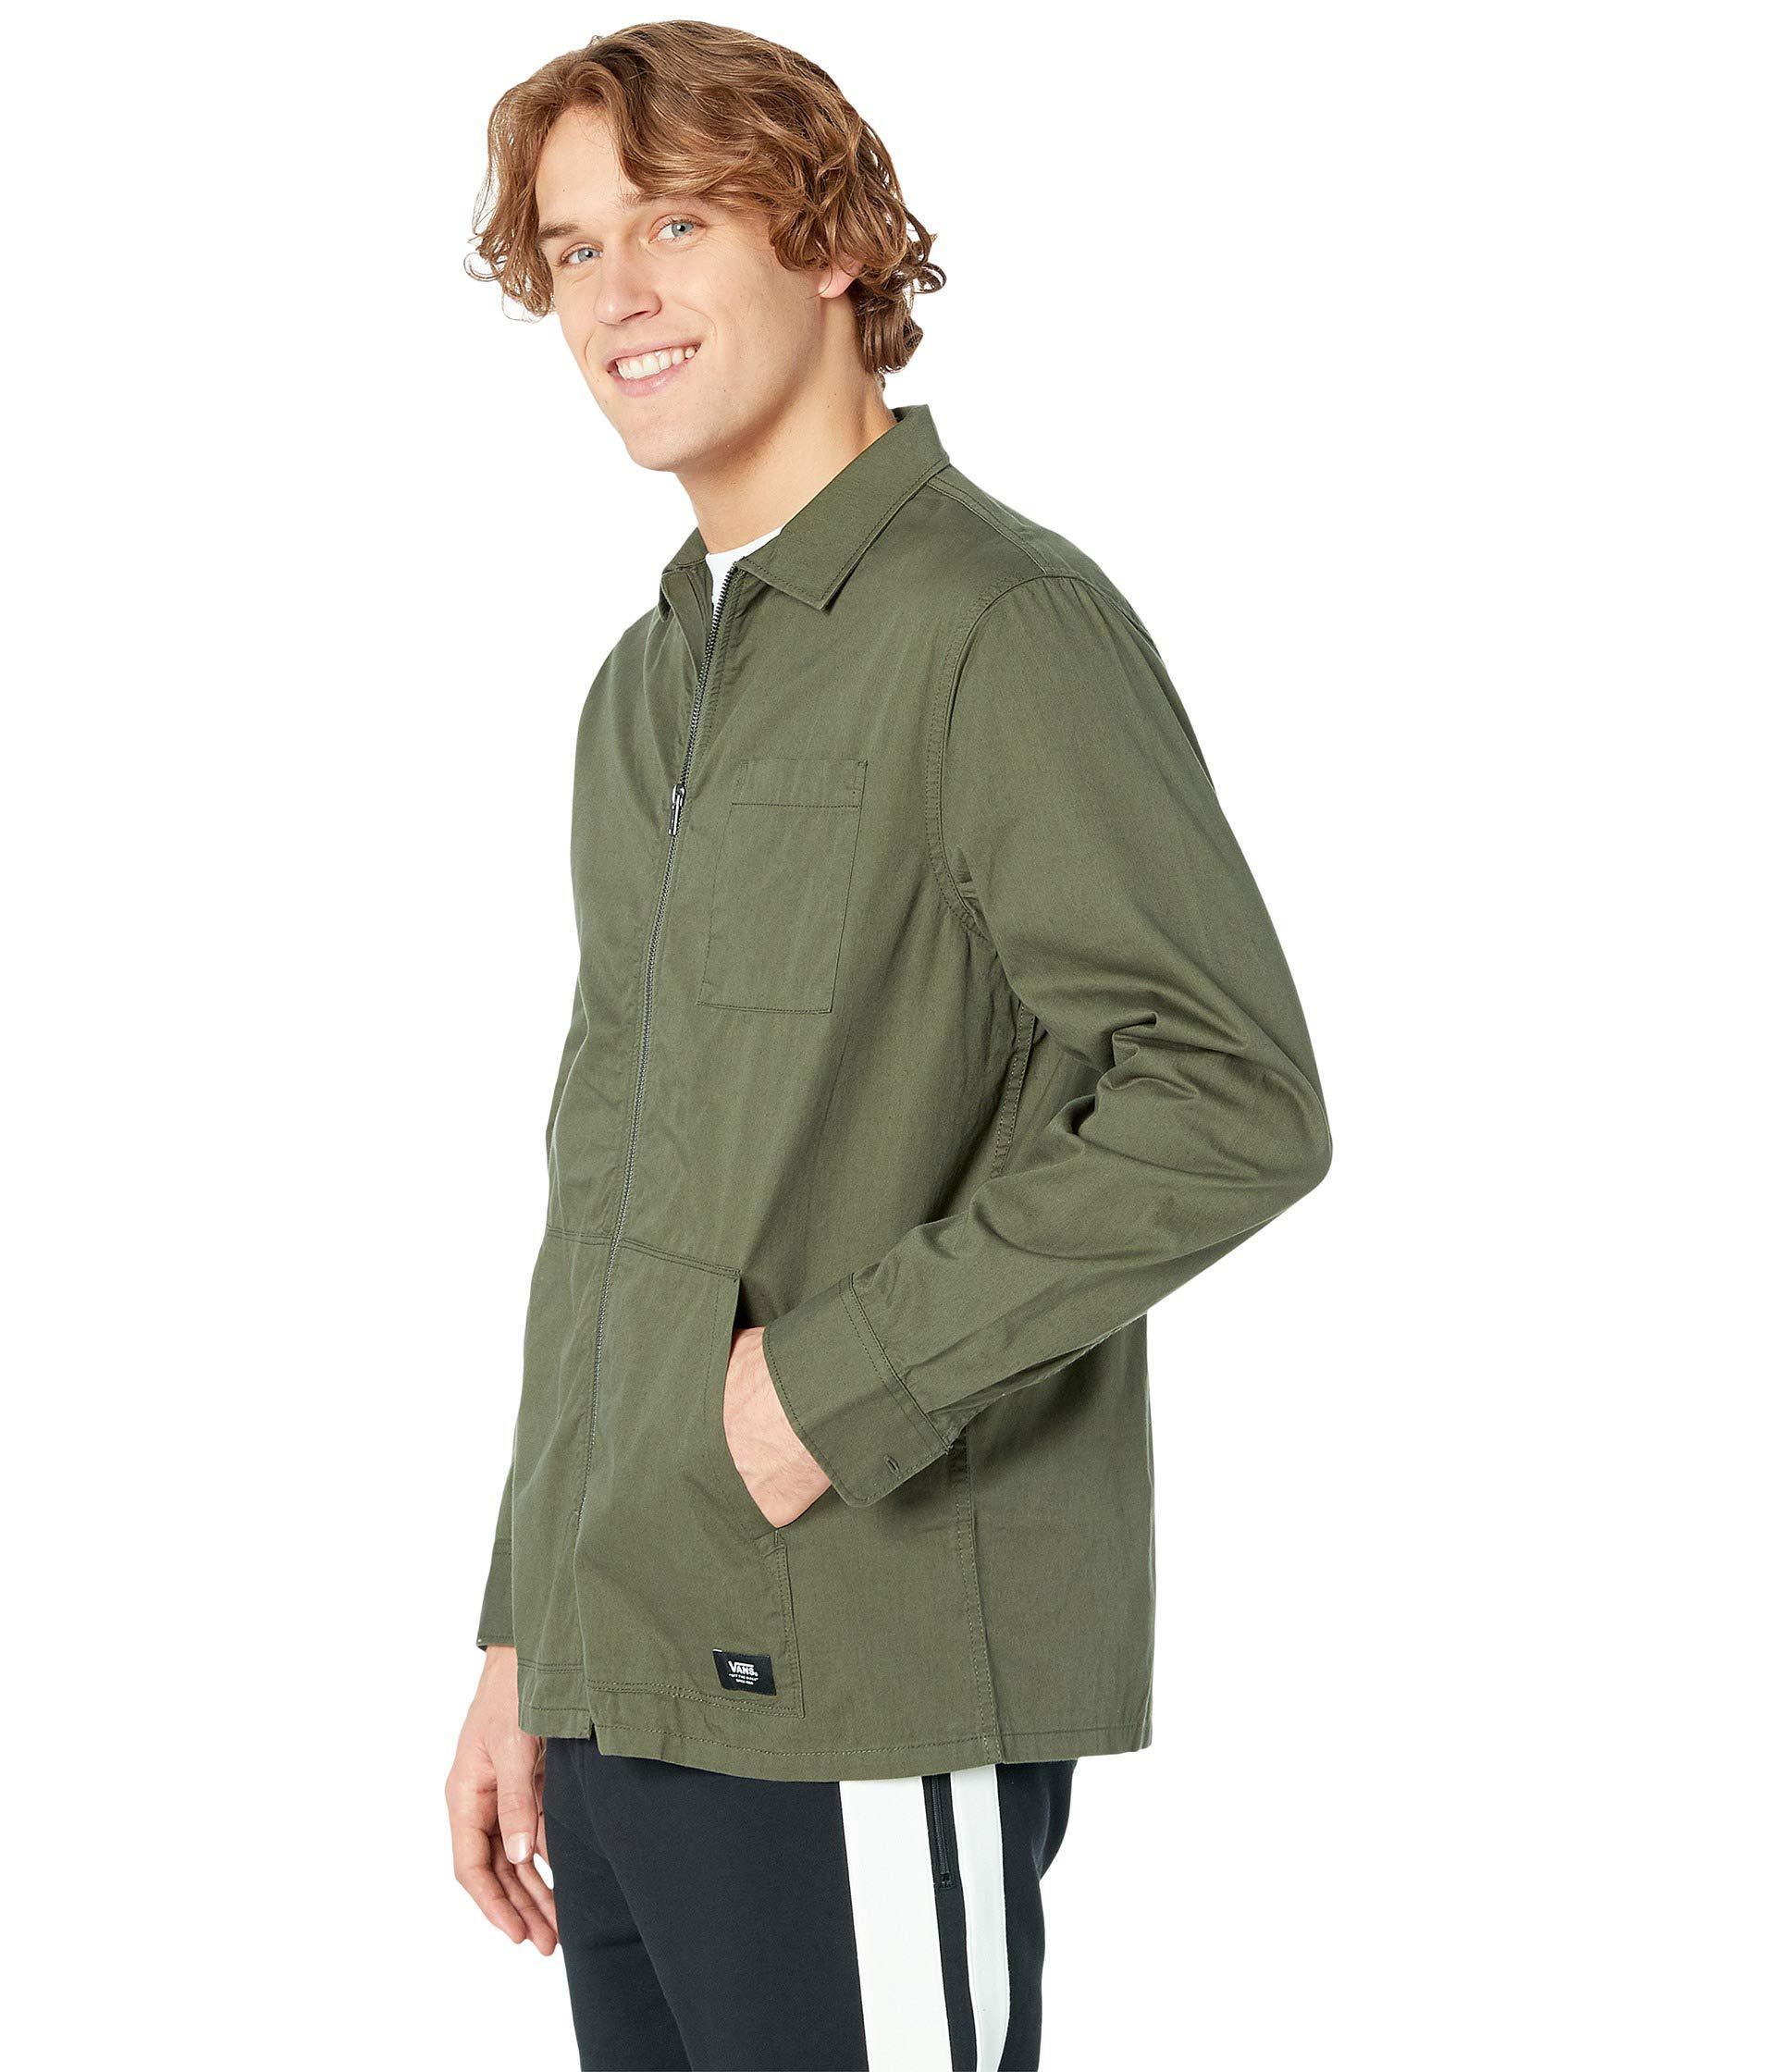 1e4717ec3f404d Lyst - Vans Felton Long Sleeve Woven Jacket (grape Leaf) Men s Clothing in  Green for Men